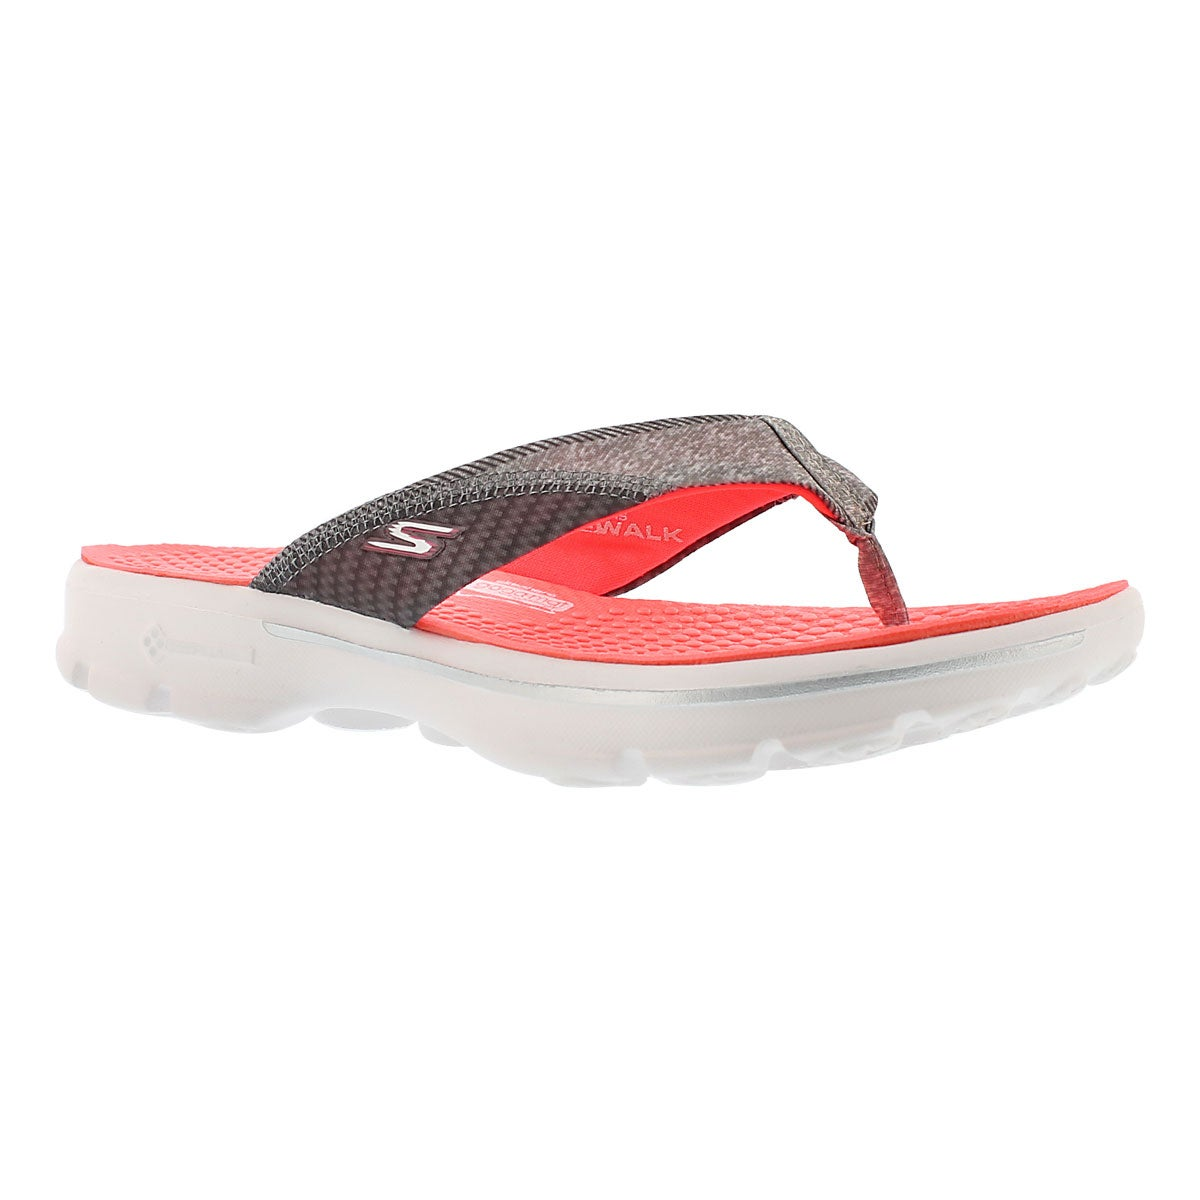 Sandale tong Pizazz, rose vif, femmes